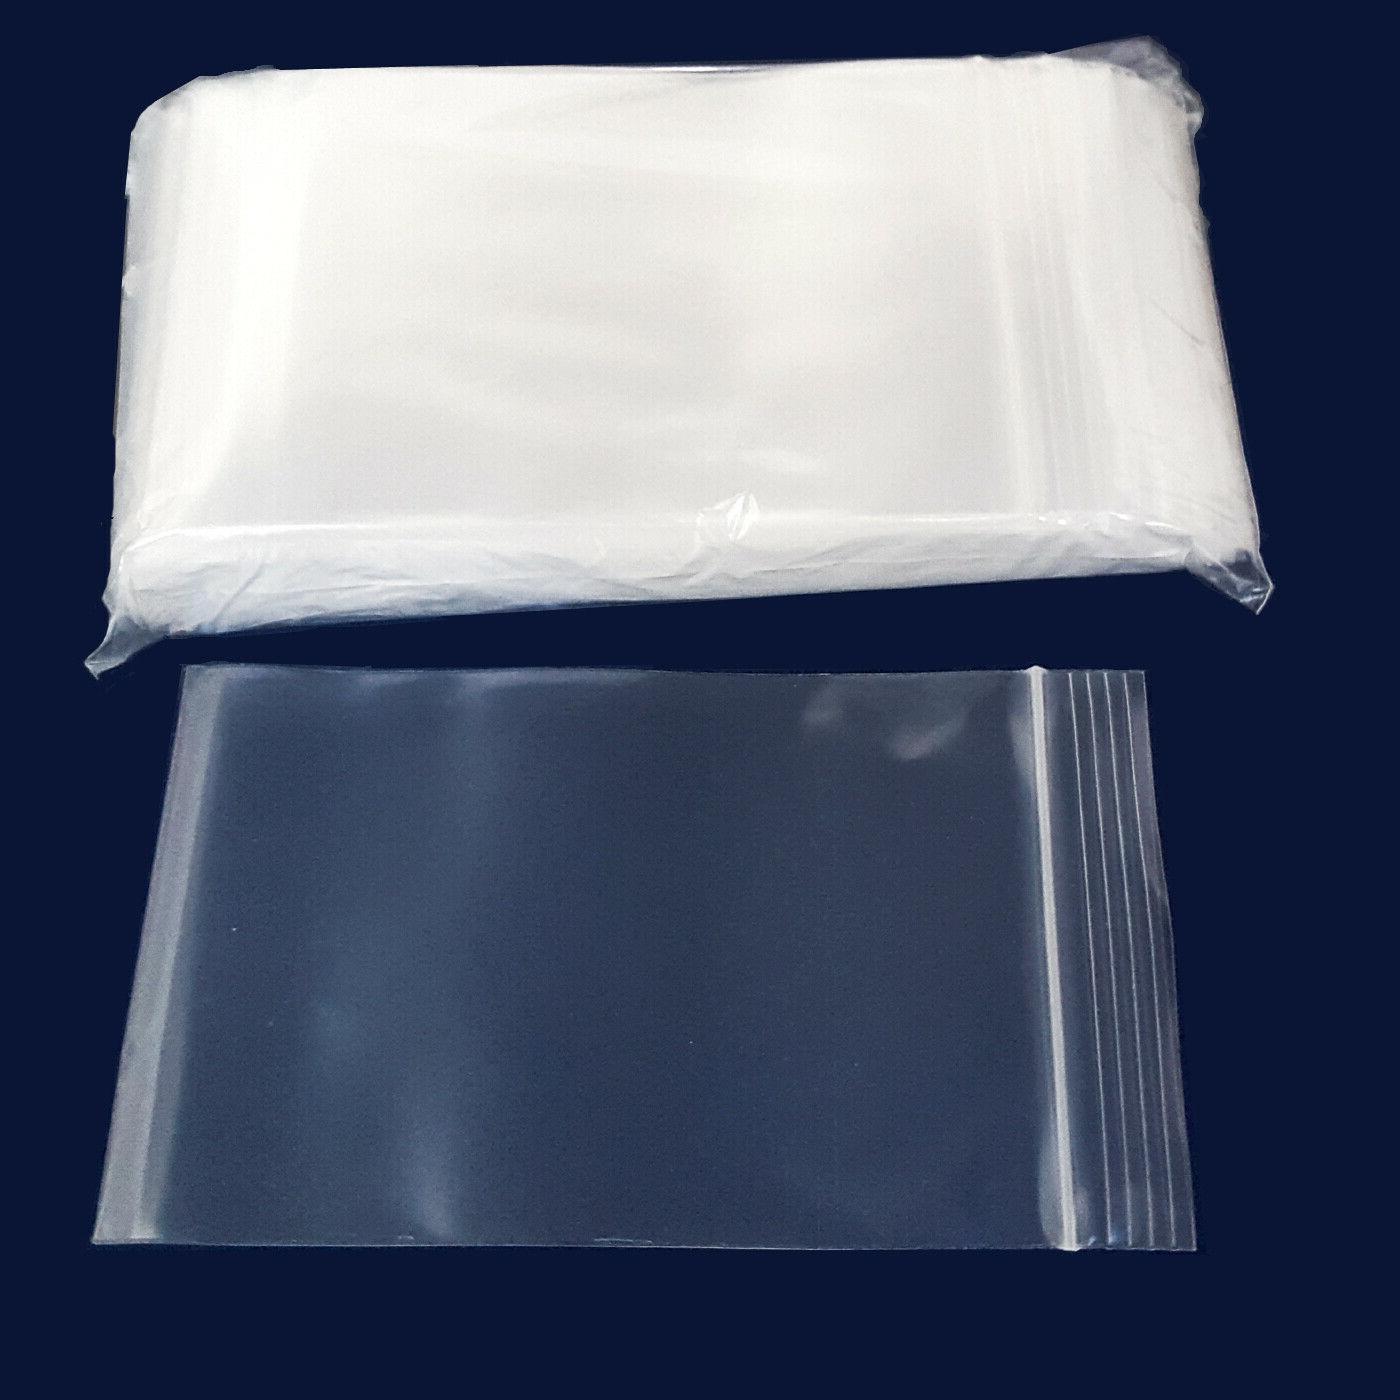 Laddawn 4-Mil Ziplock Bags Reclosable Zip Lock